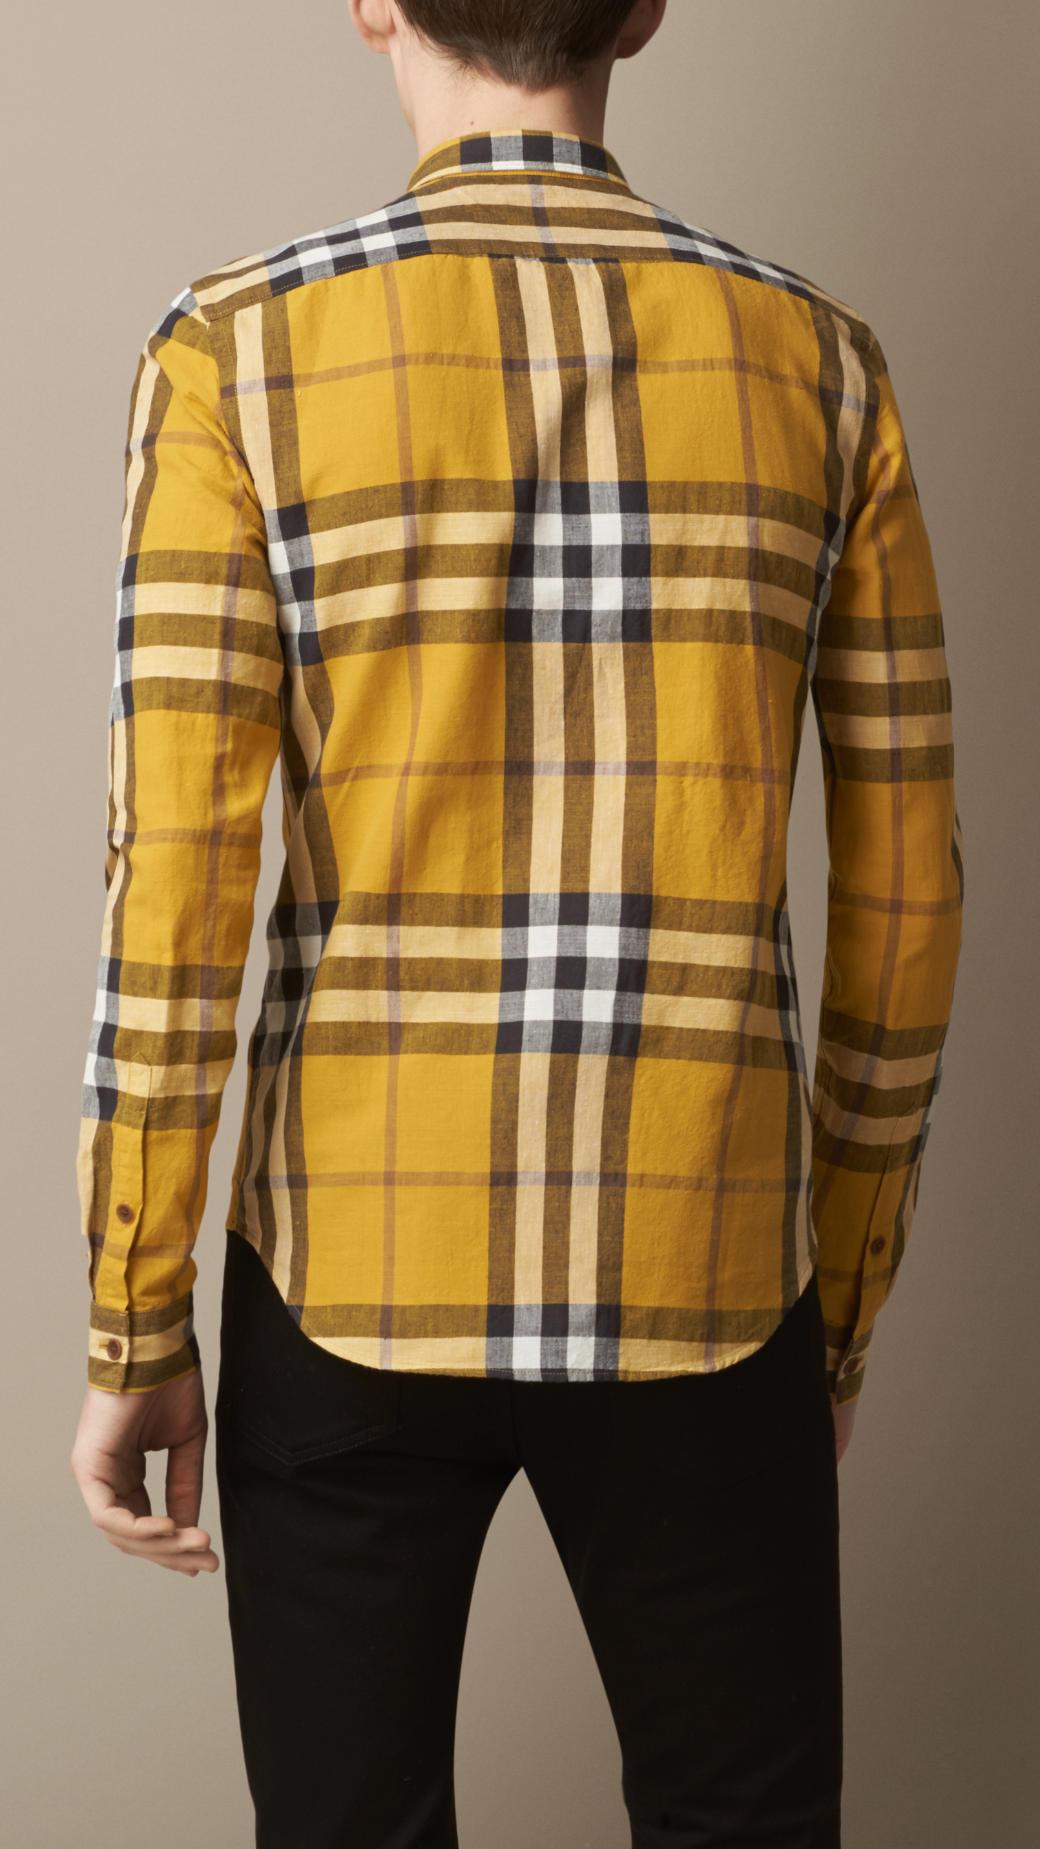 burberry clearance outlet online oftr  burberry linen shirt